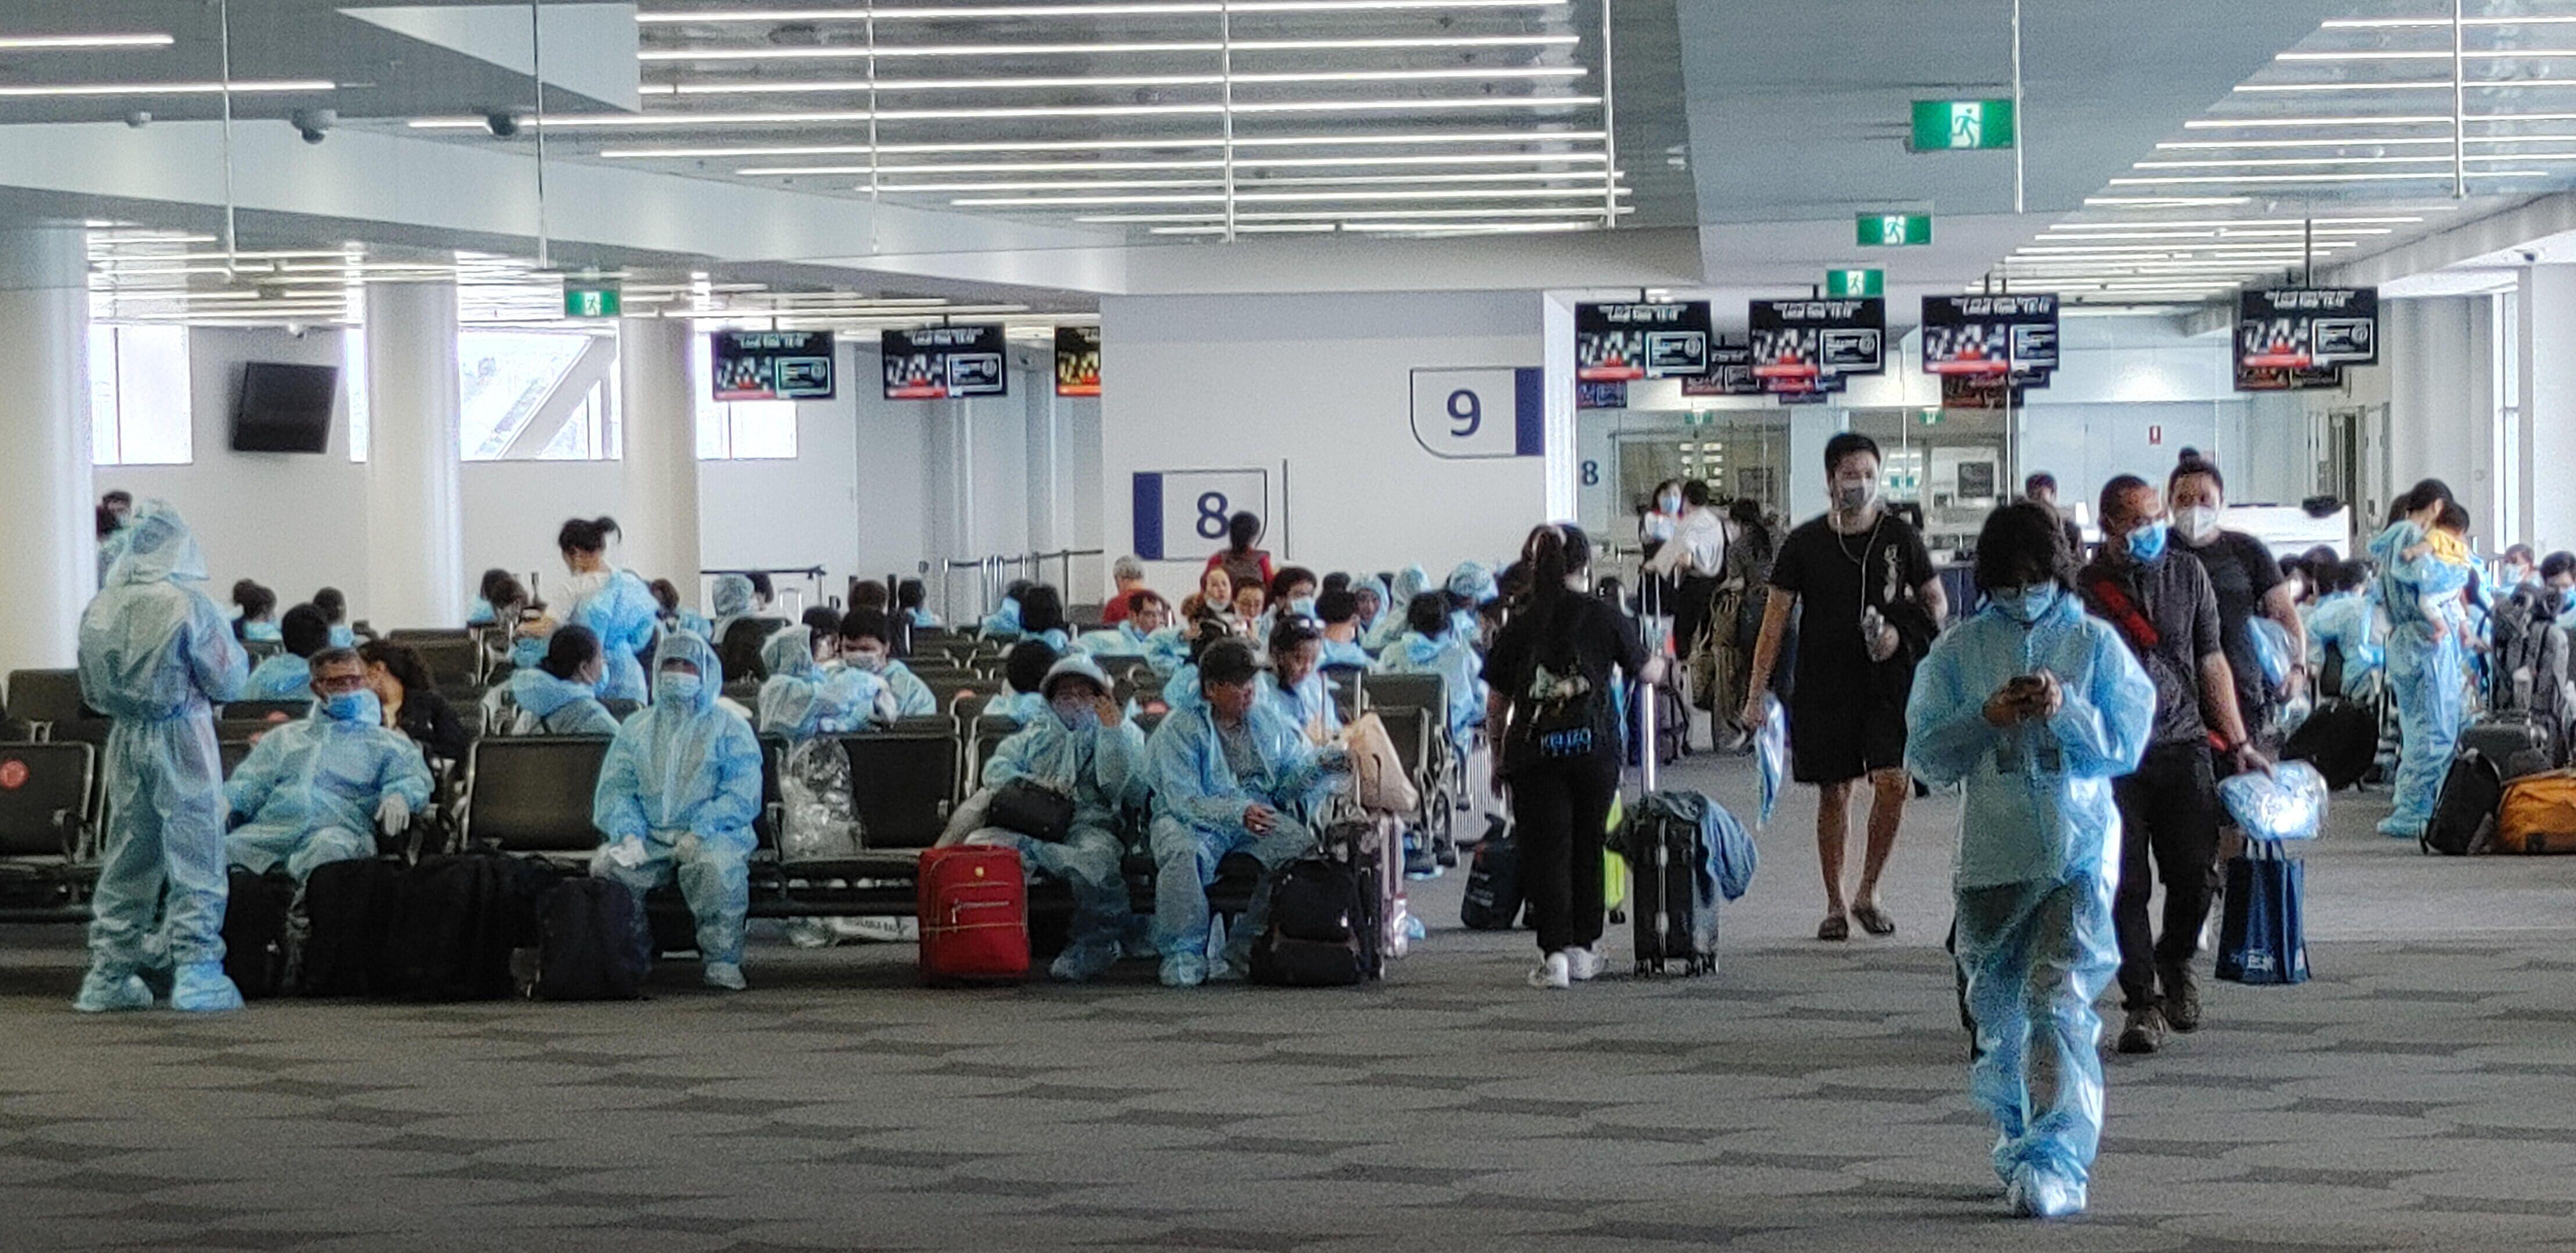 covid-airport